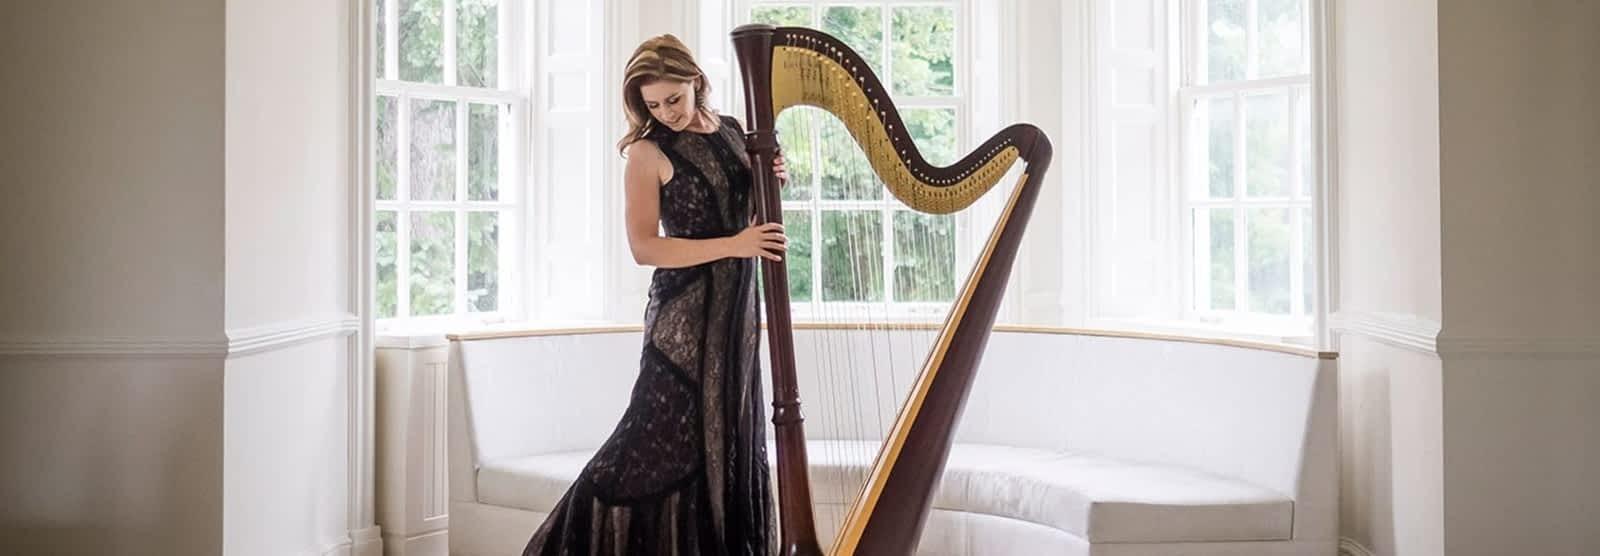 chantal-dube-the-wedding-harpist-1.jpg